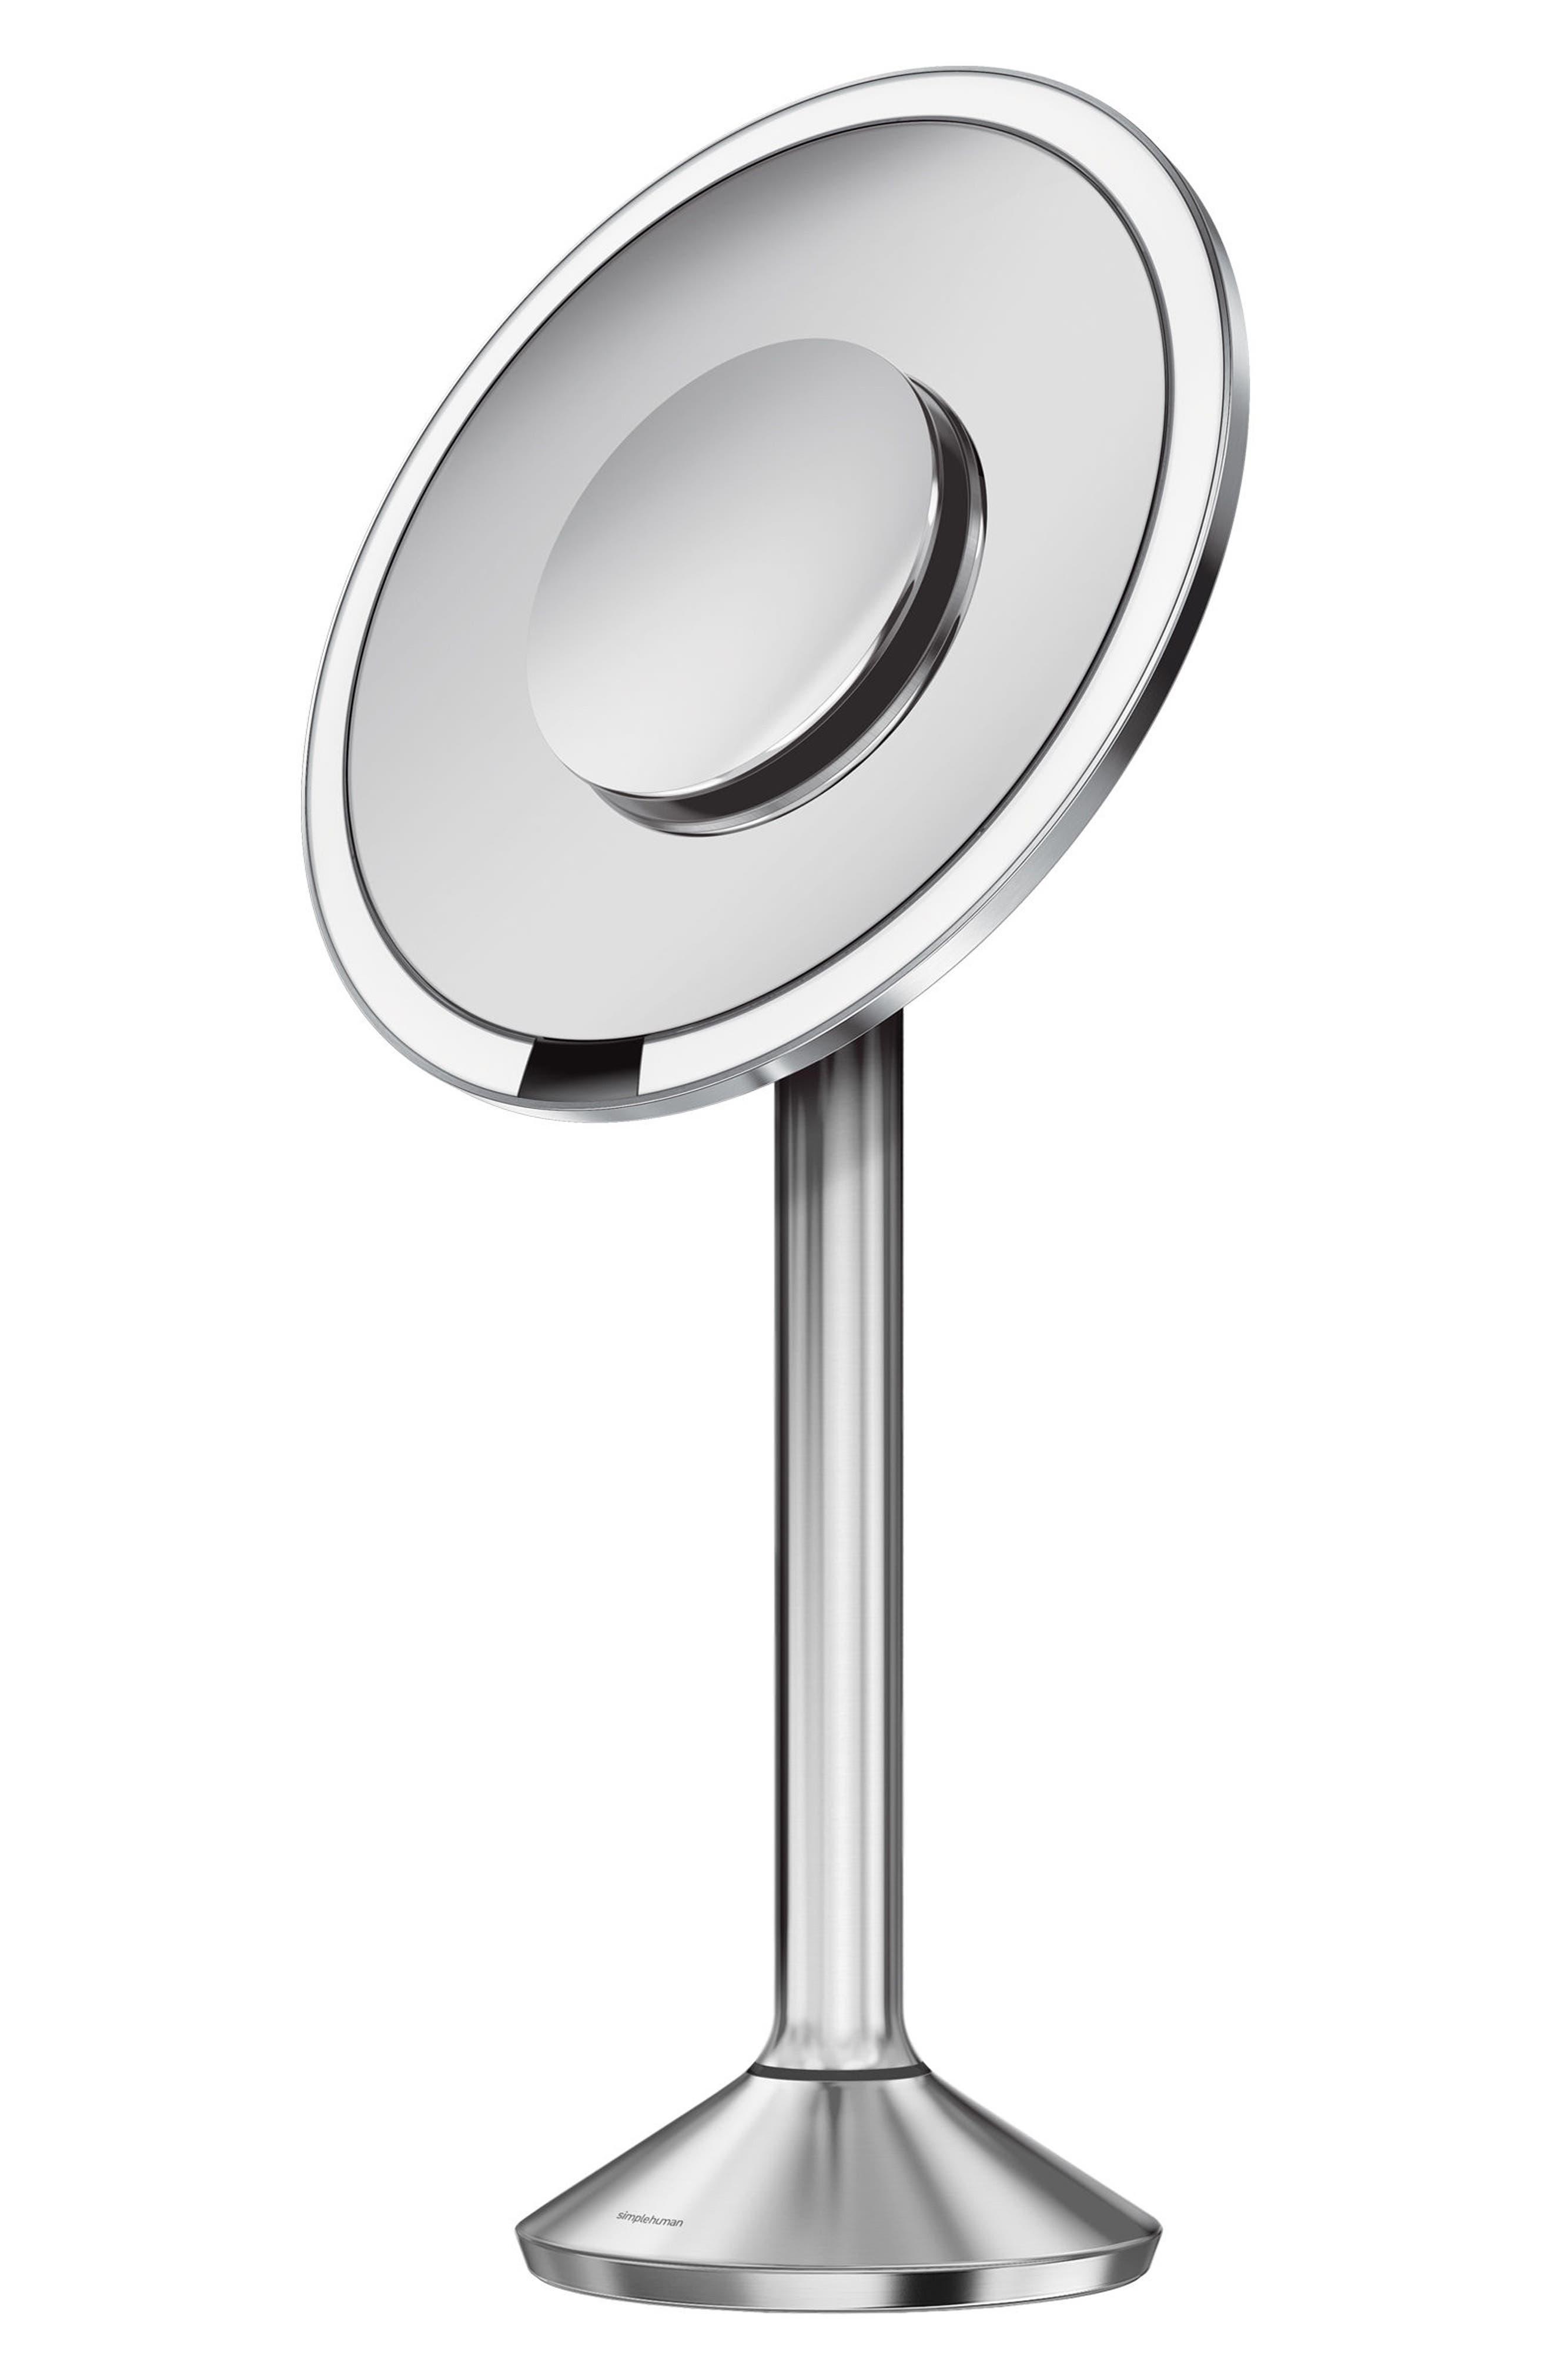 Main Image - simplehuman Round Sensor Mirror Pro (8 Inch)